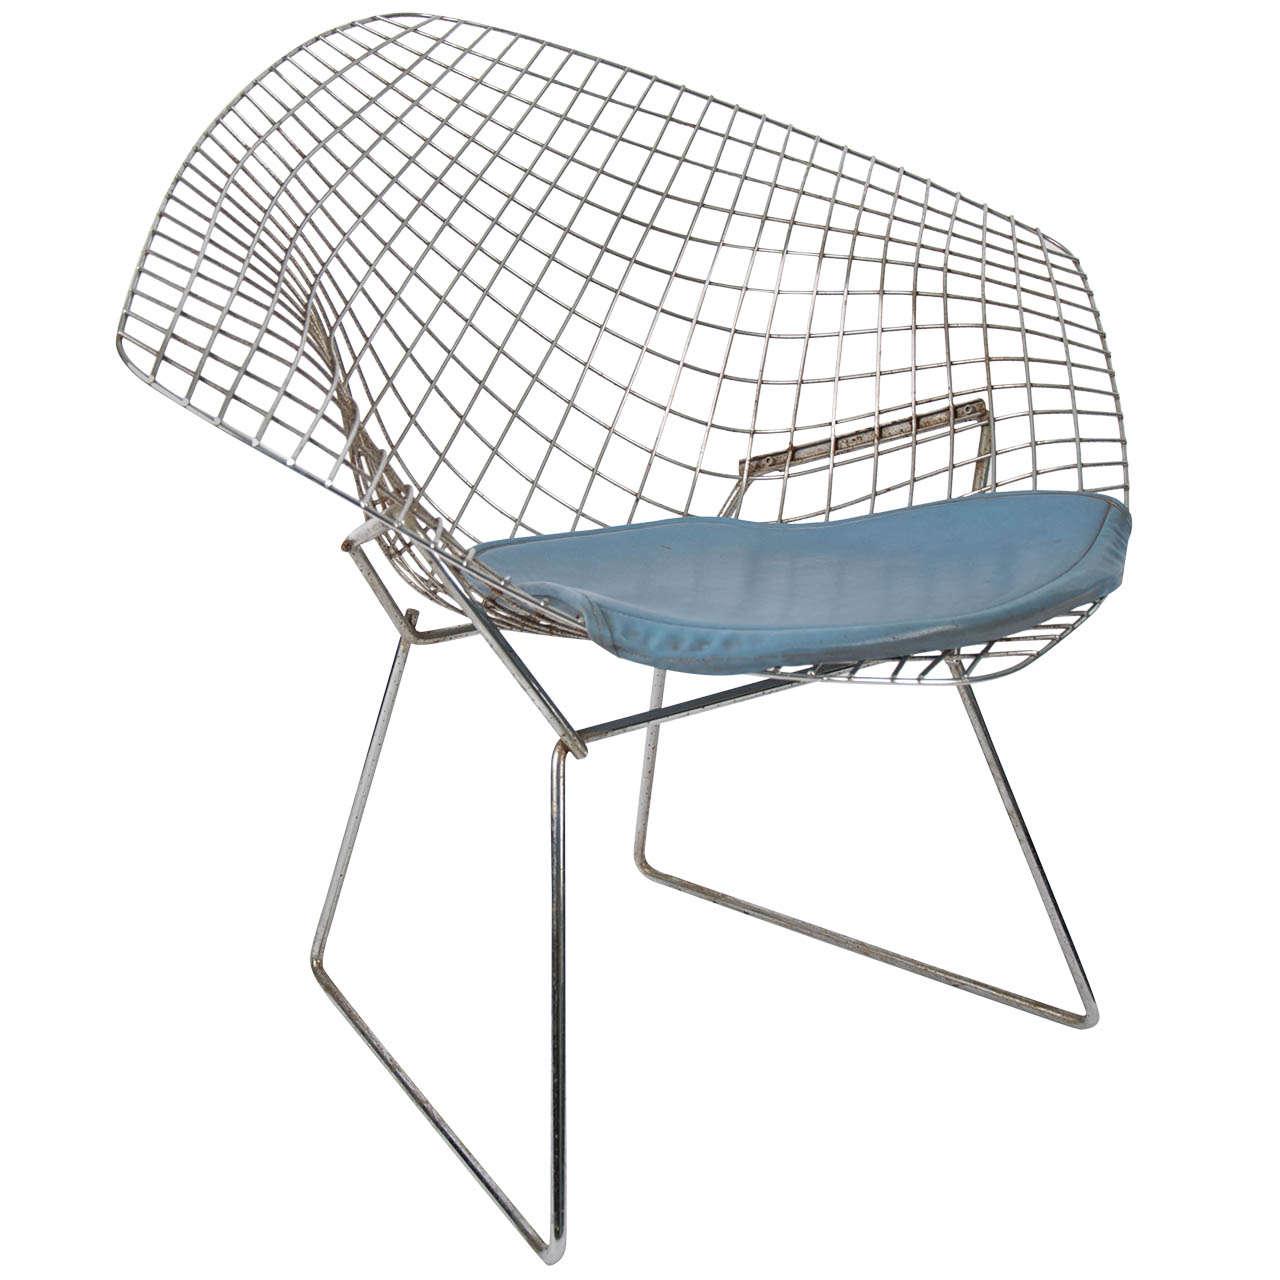 harry bertoia chrome diamond chair 1950 at 1stdibs. Black Bedroom Furniture Sets. Home Design Ideas